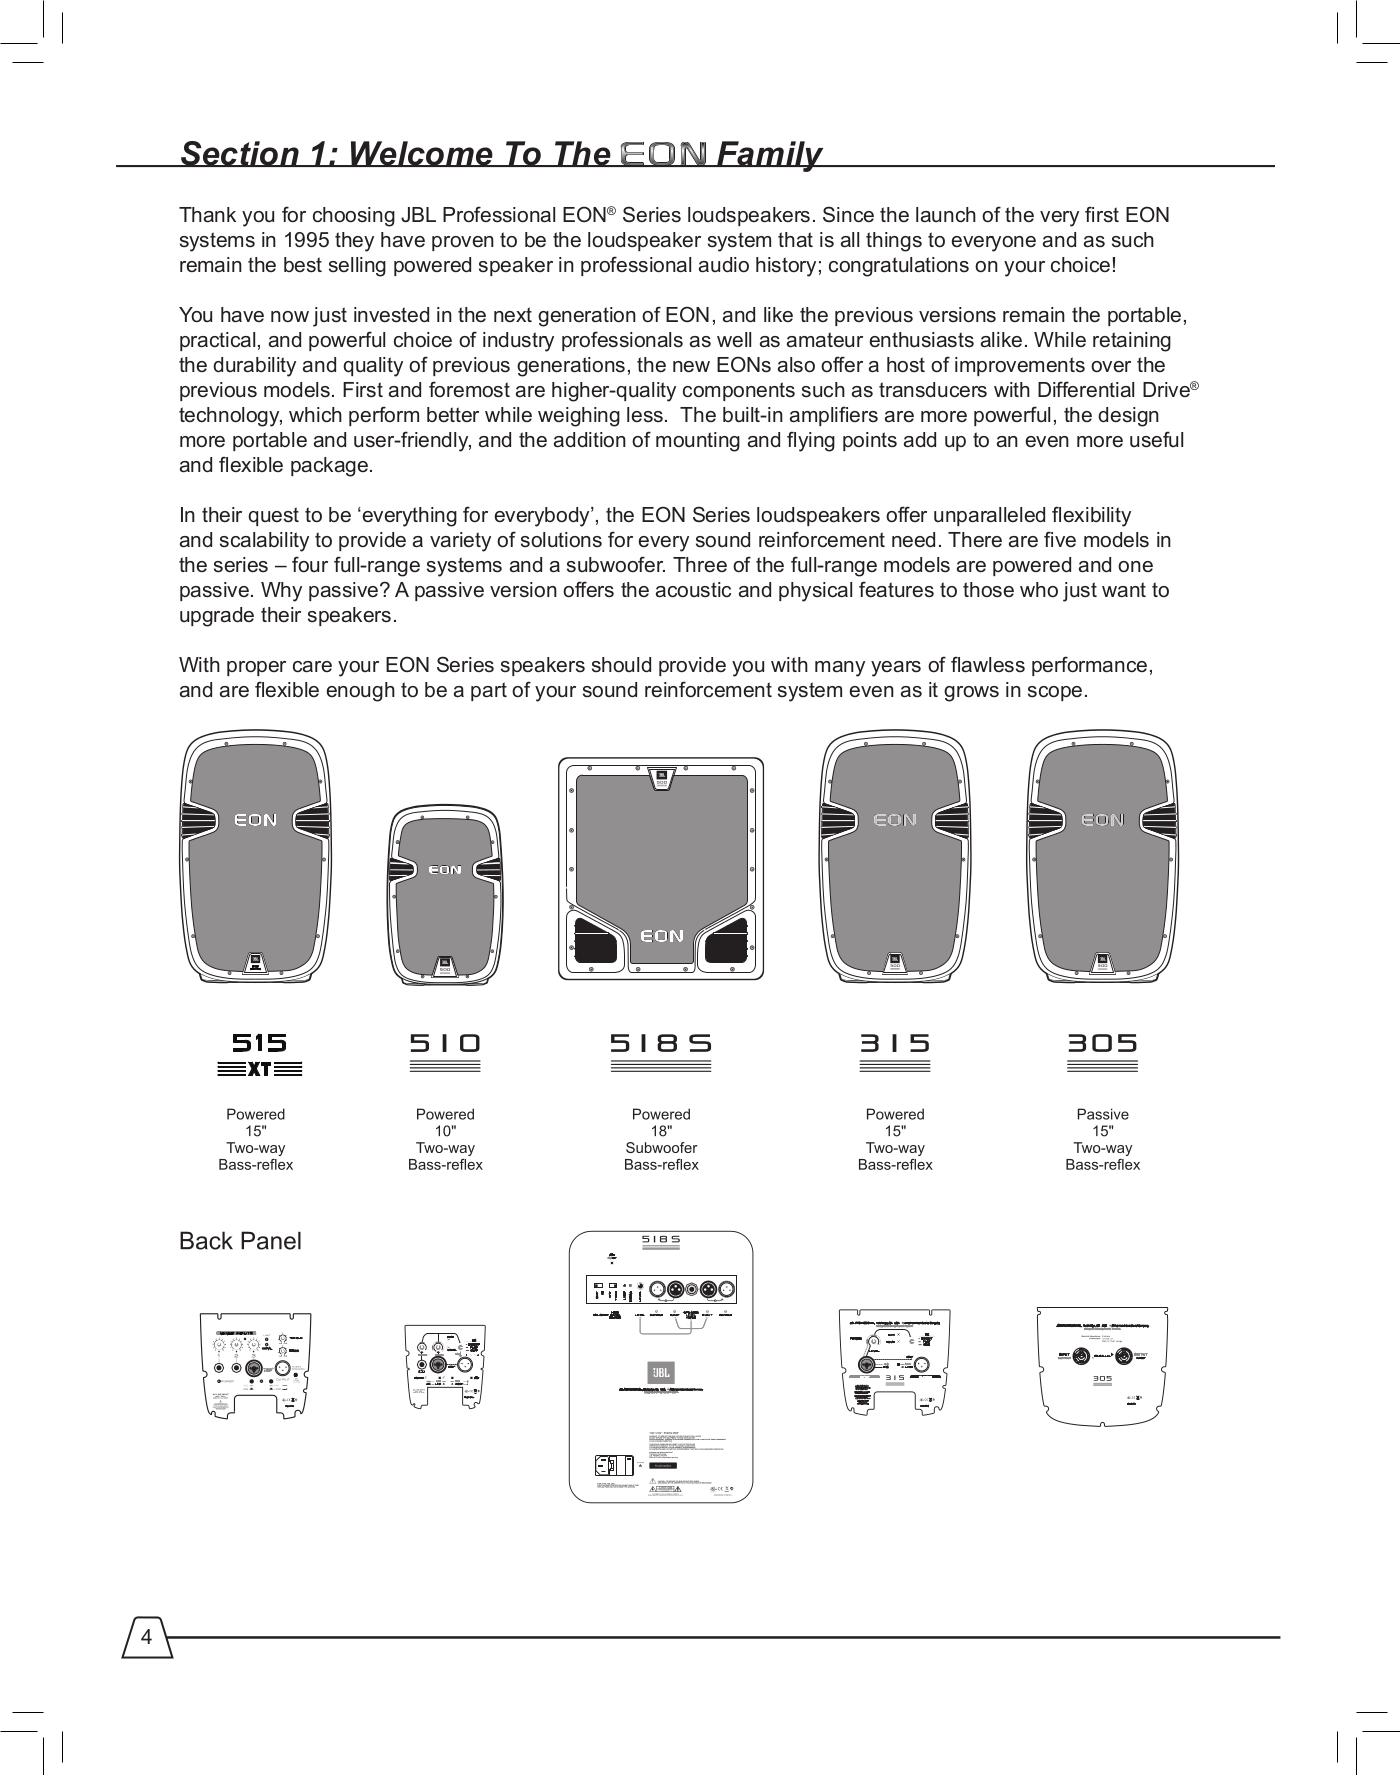 pdf manual for jbl speaker jbl on time rh umlib com jbl eon 515 xt manual jbl eon 515 xt manual pdf